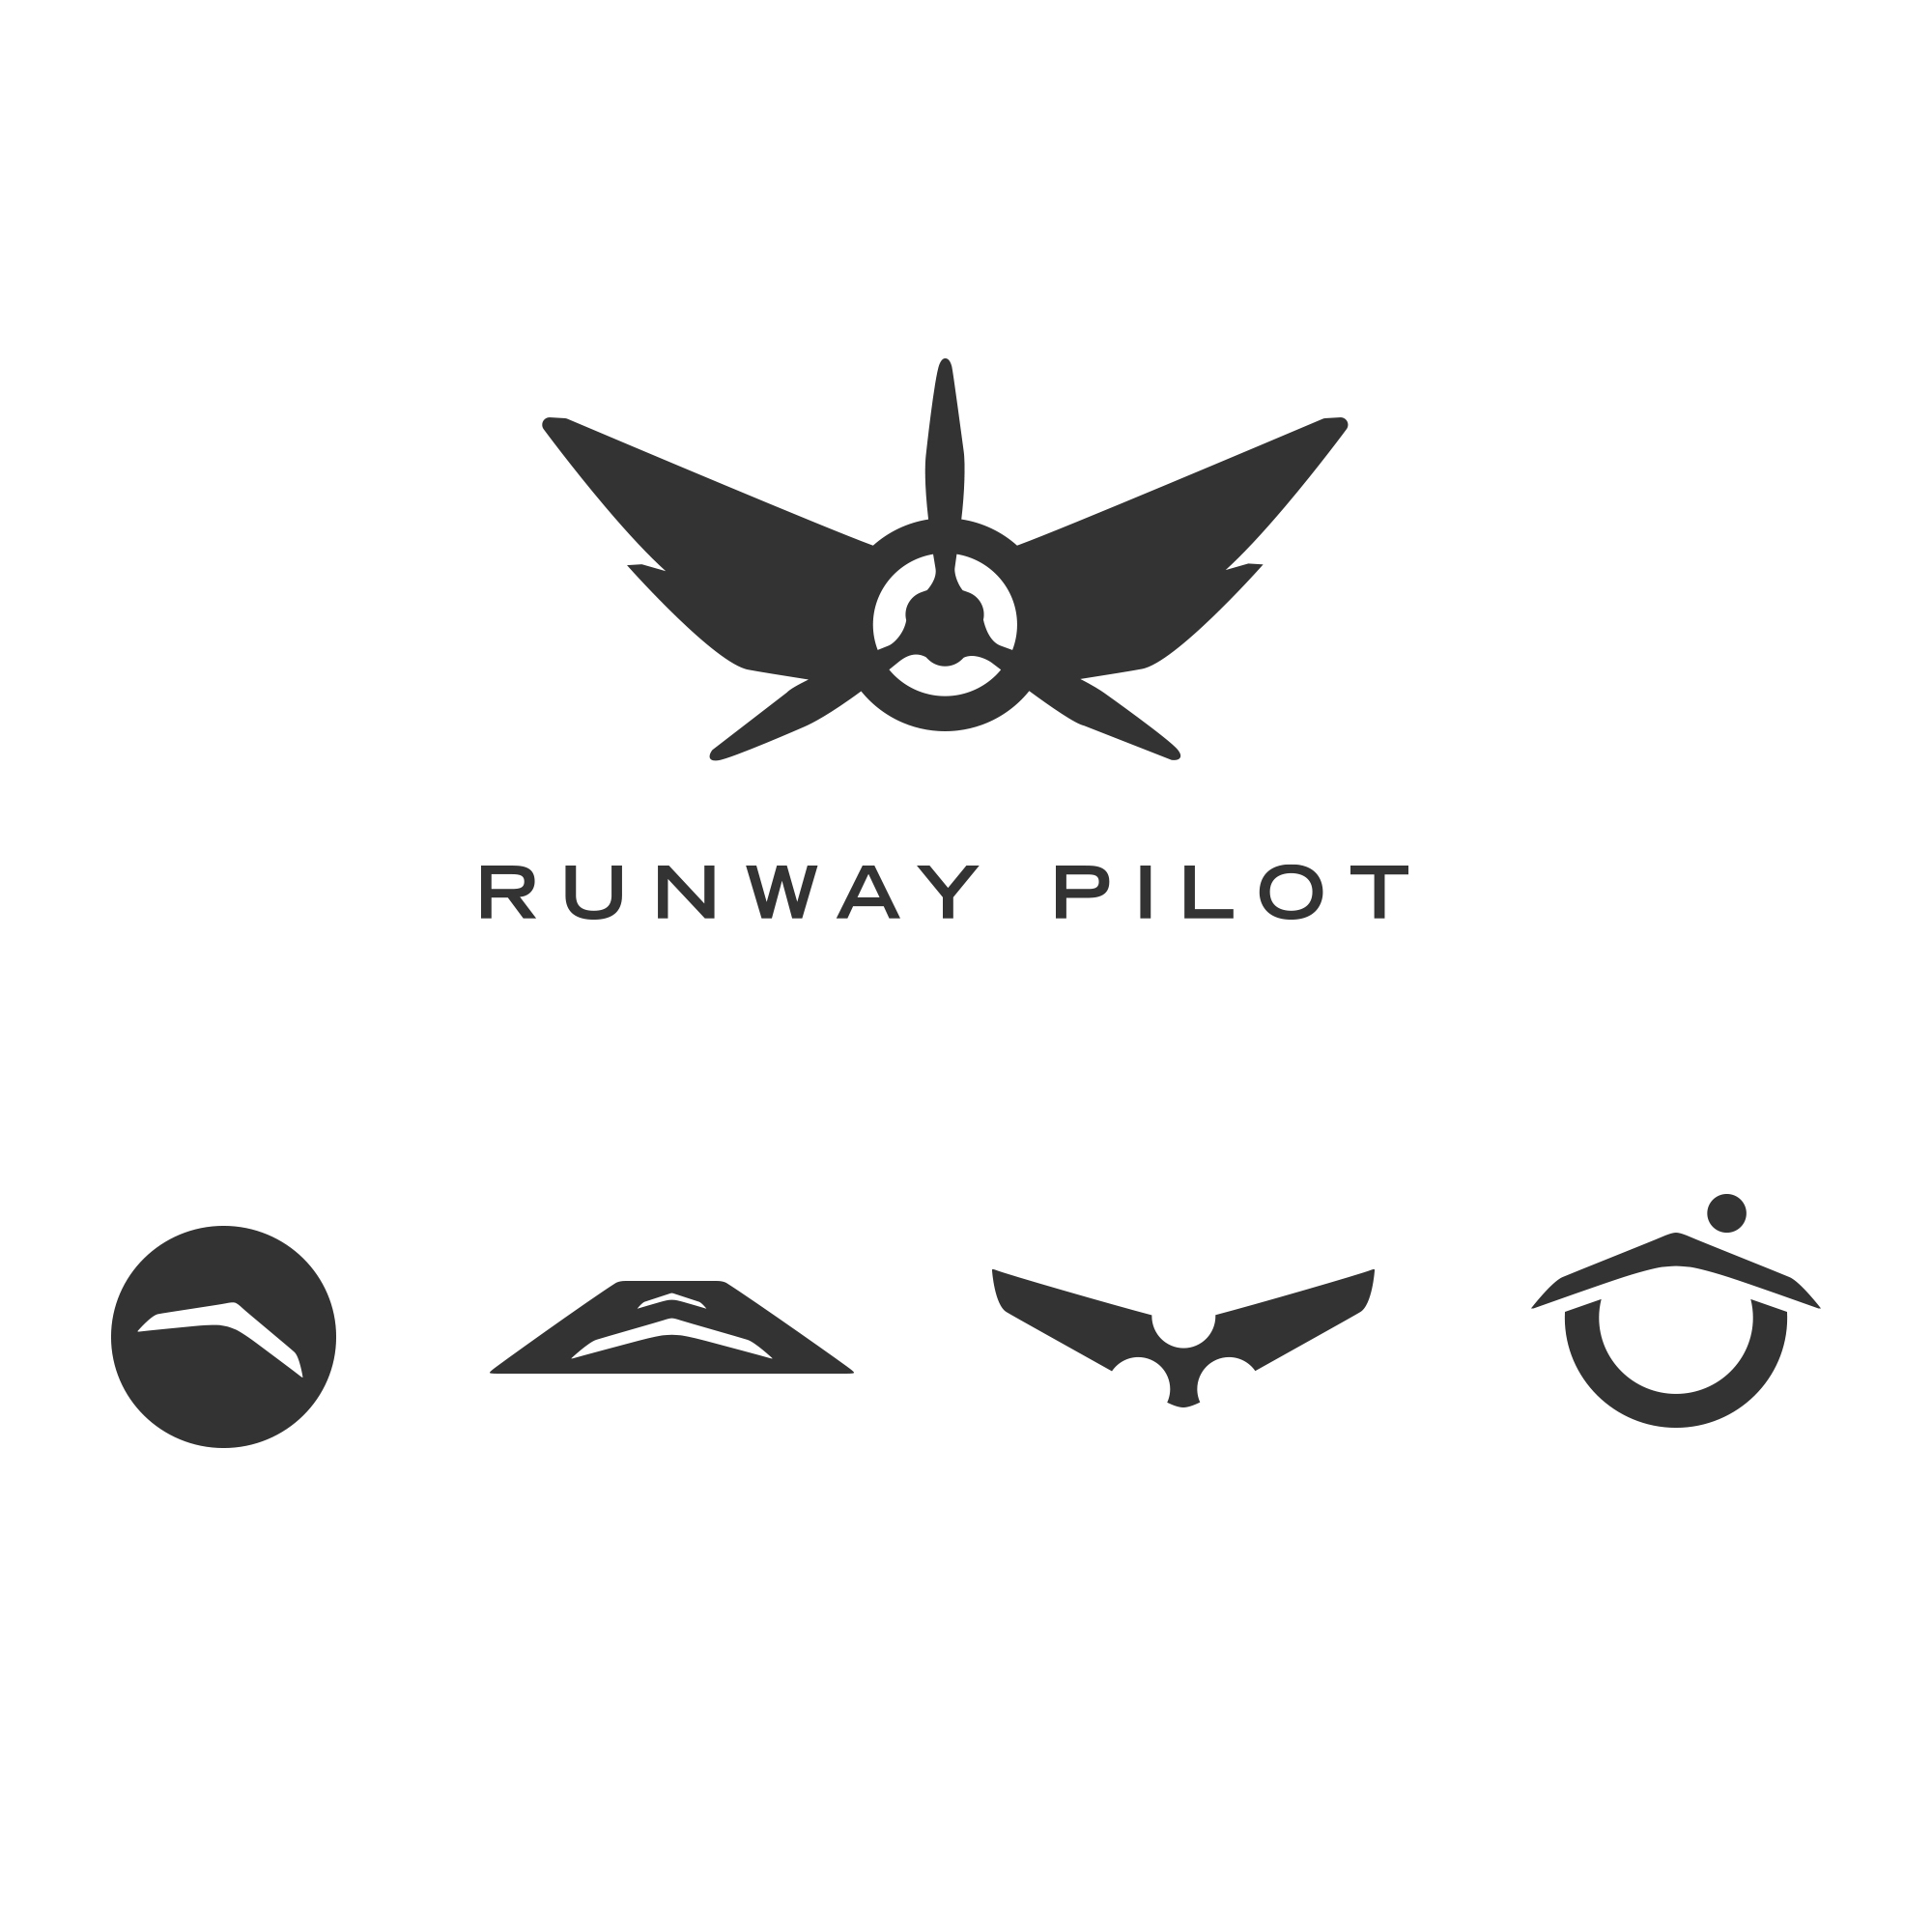 ajr-logos-011-RunwayPilot